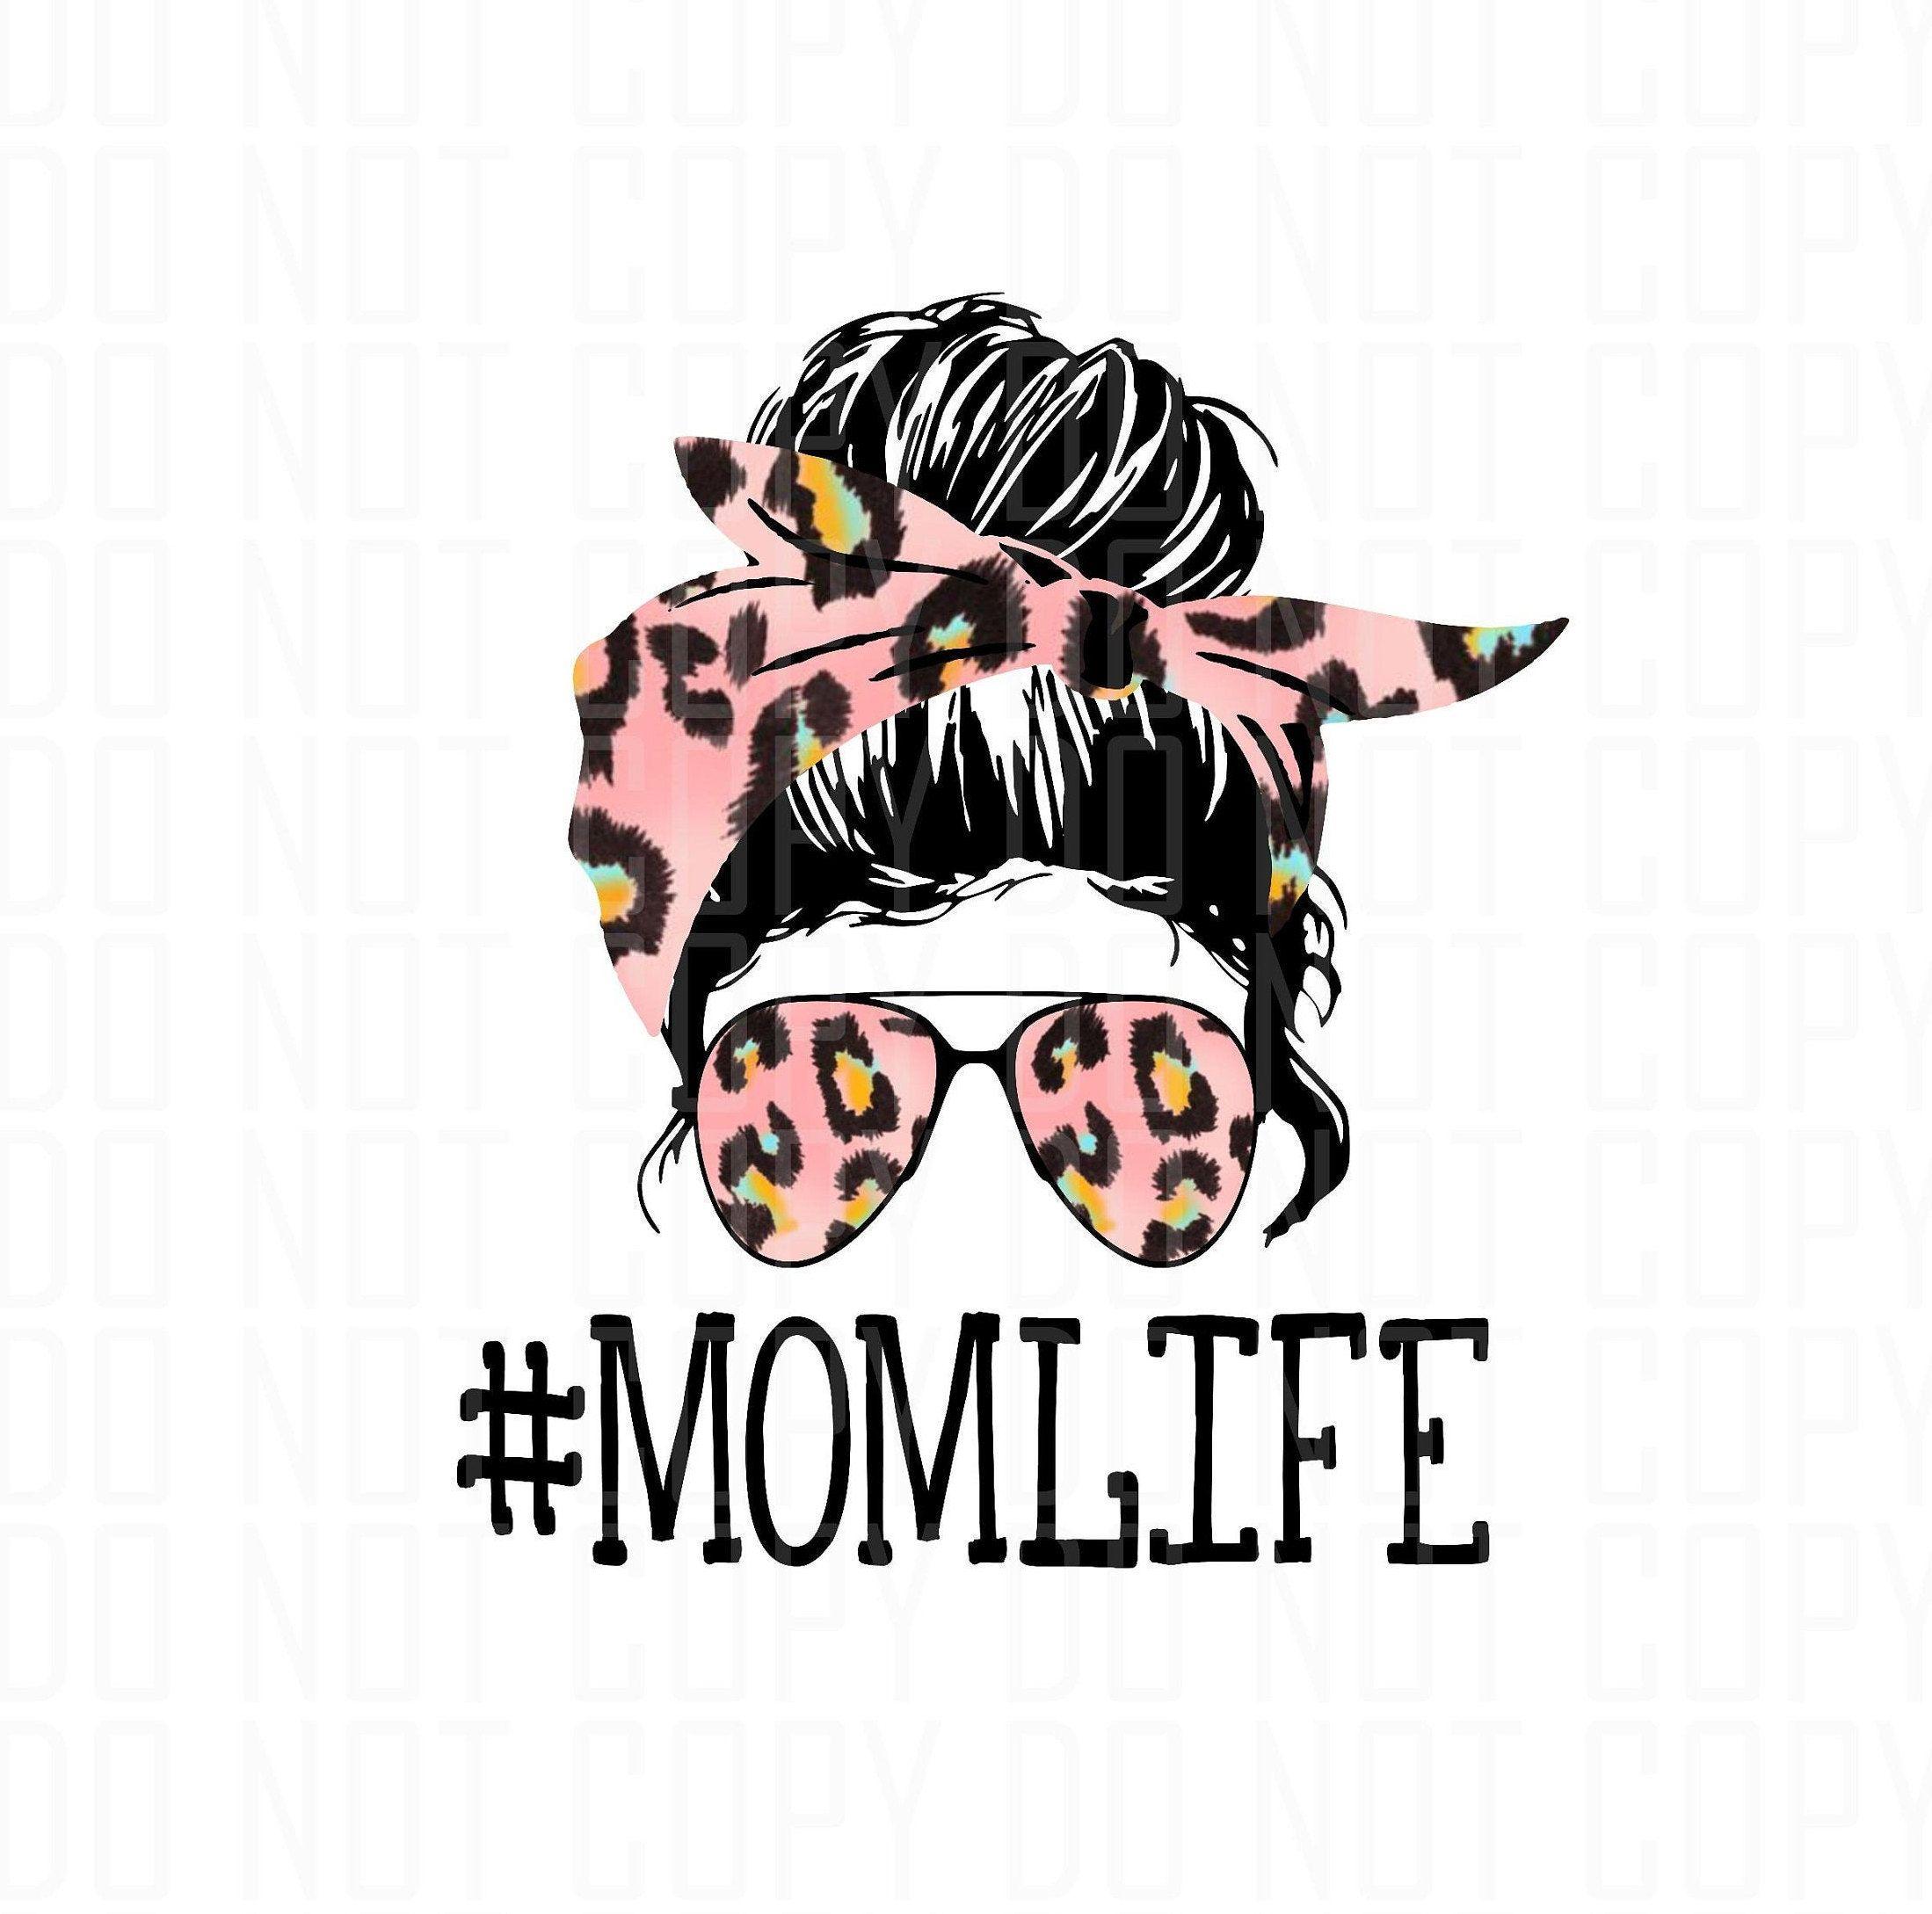 Messy Bun Mom Life Svg Free  – 326+ File for DIY T-shirt, Mug, Decoration and more